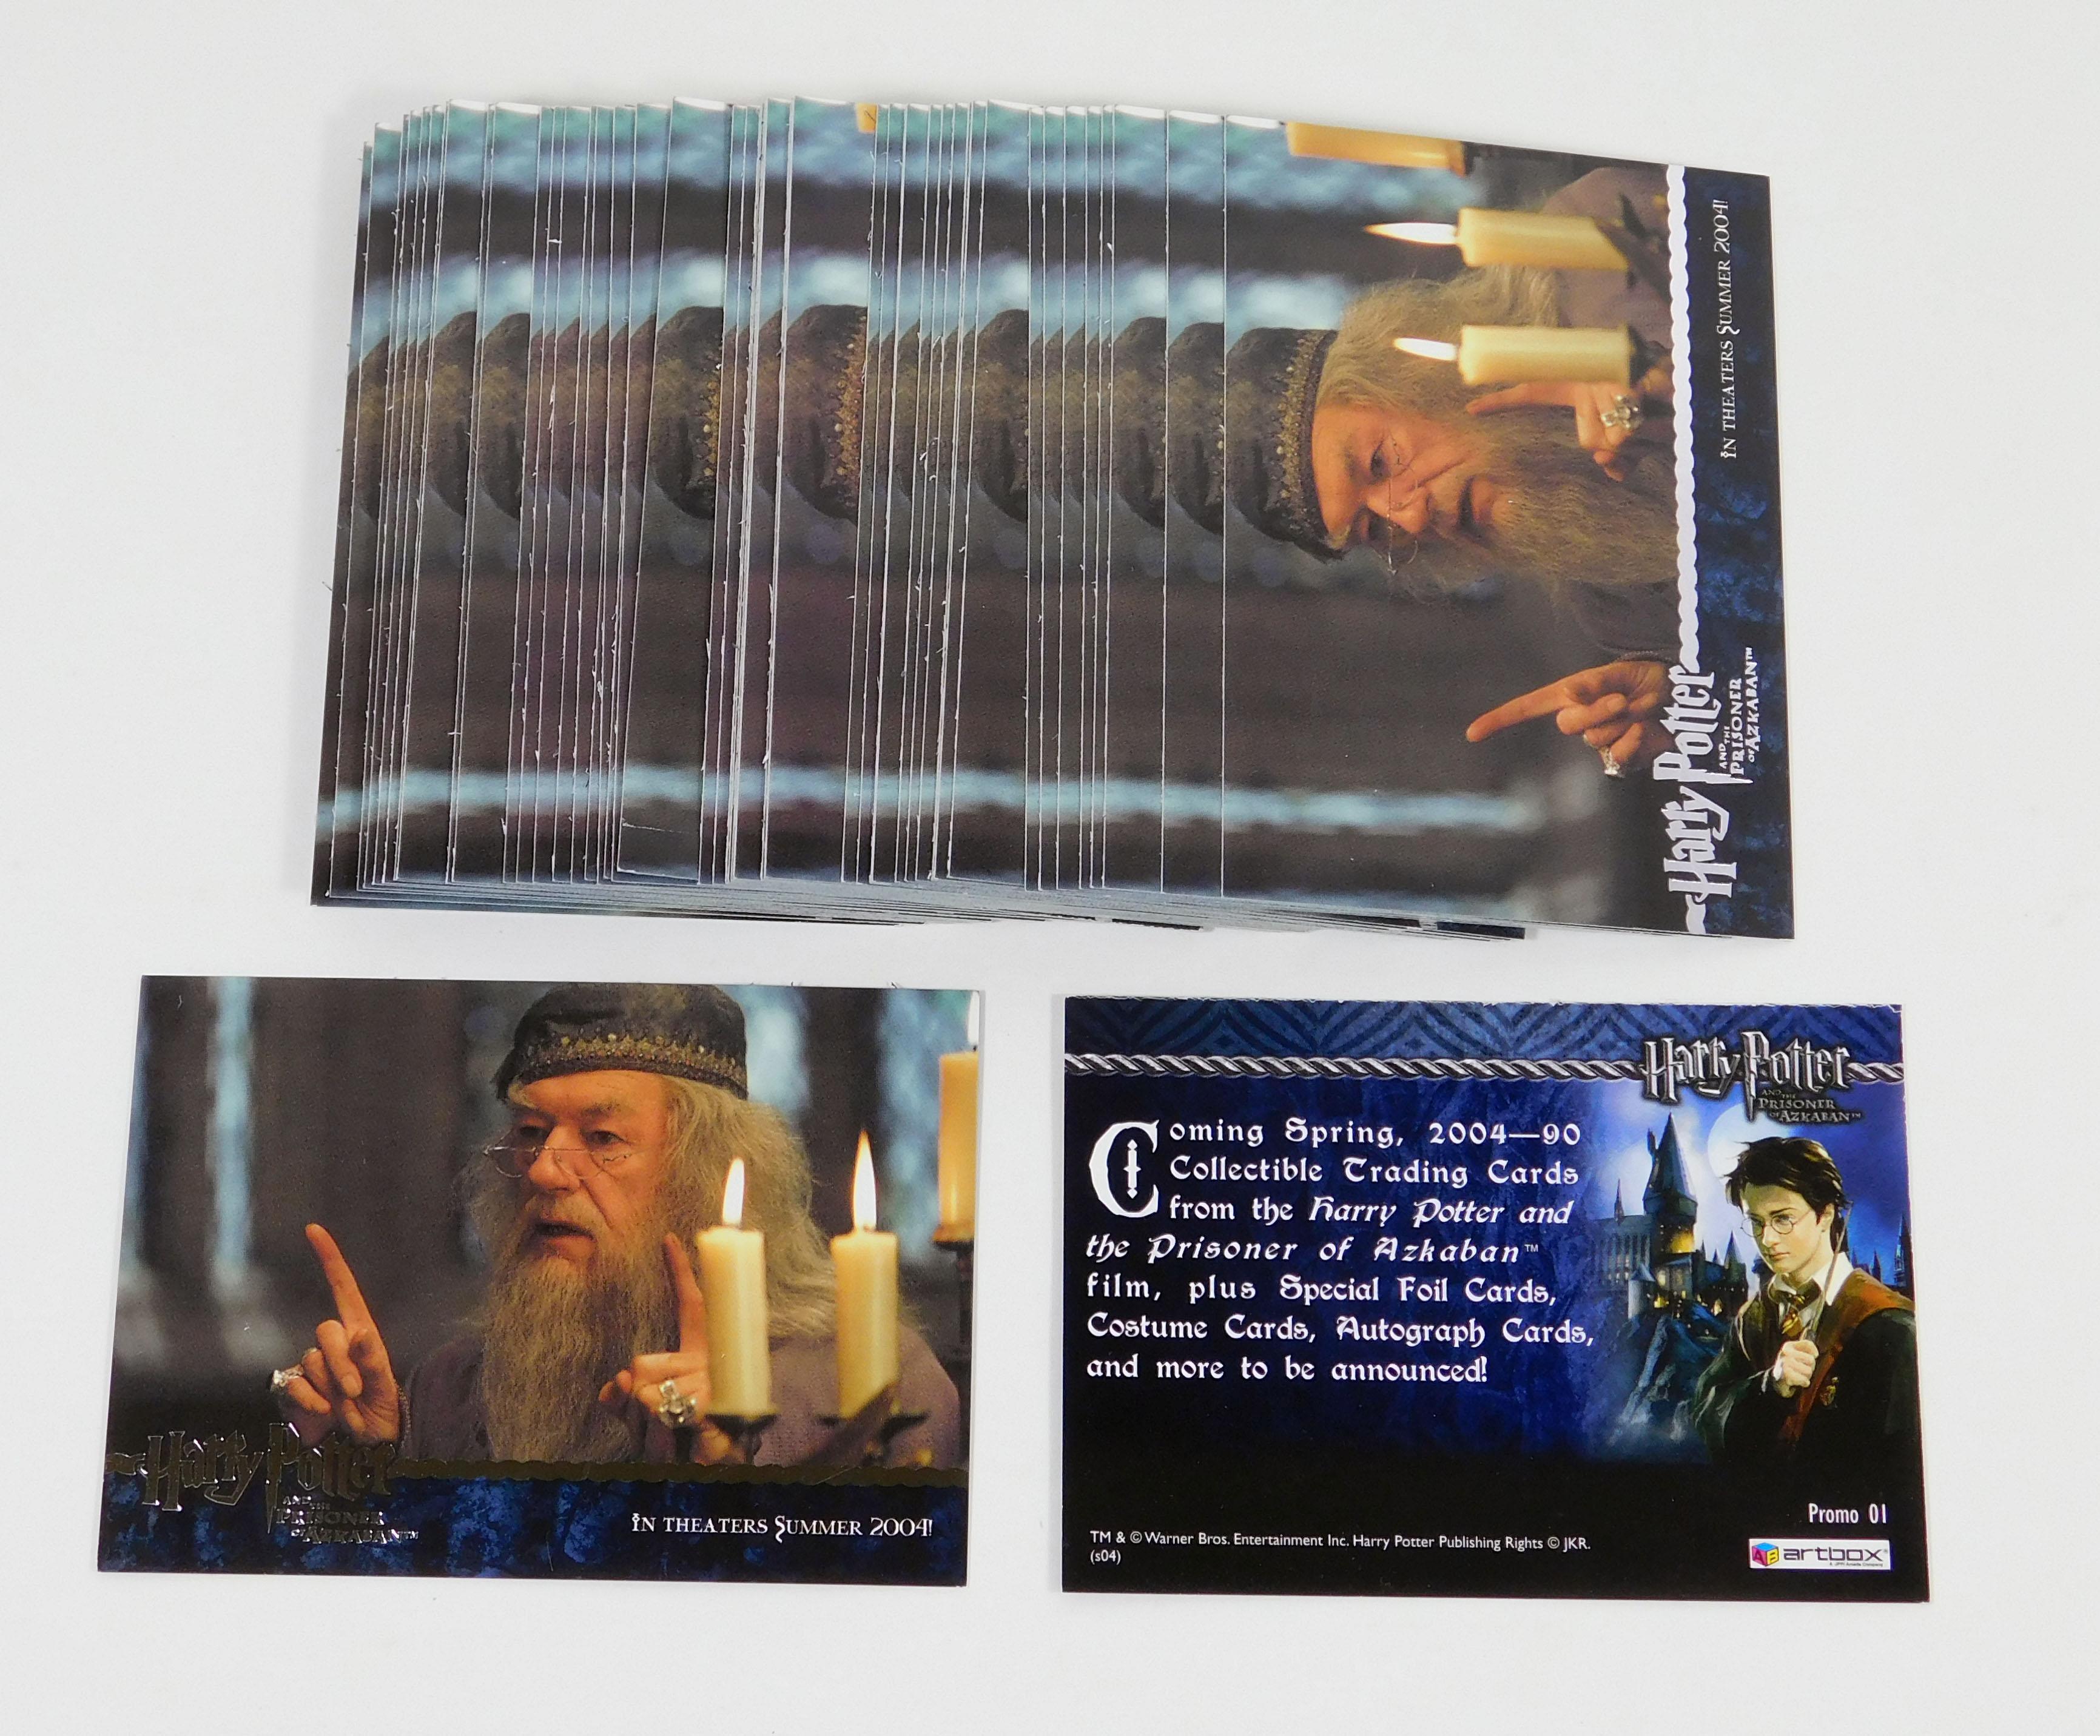 HARRY POTTER THE PRISONER OF AZKABAN PROMO CARD  ARTBOX